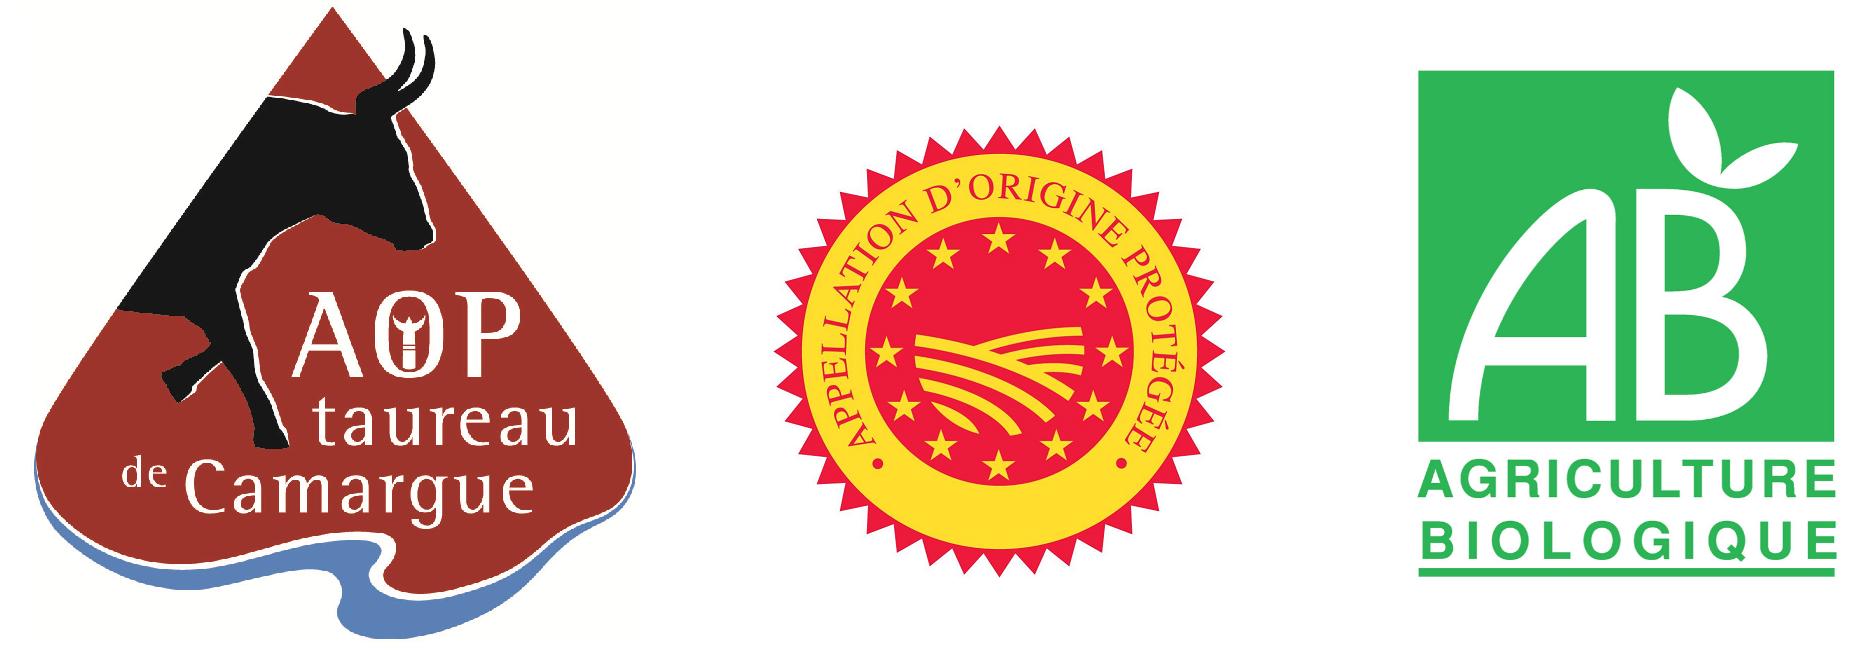 label viande taureau AOP bio manade producteur eleveur